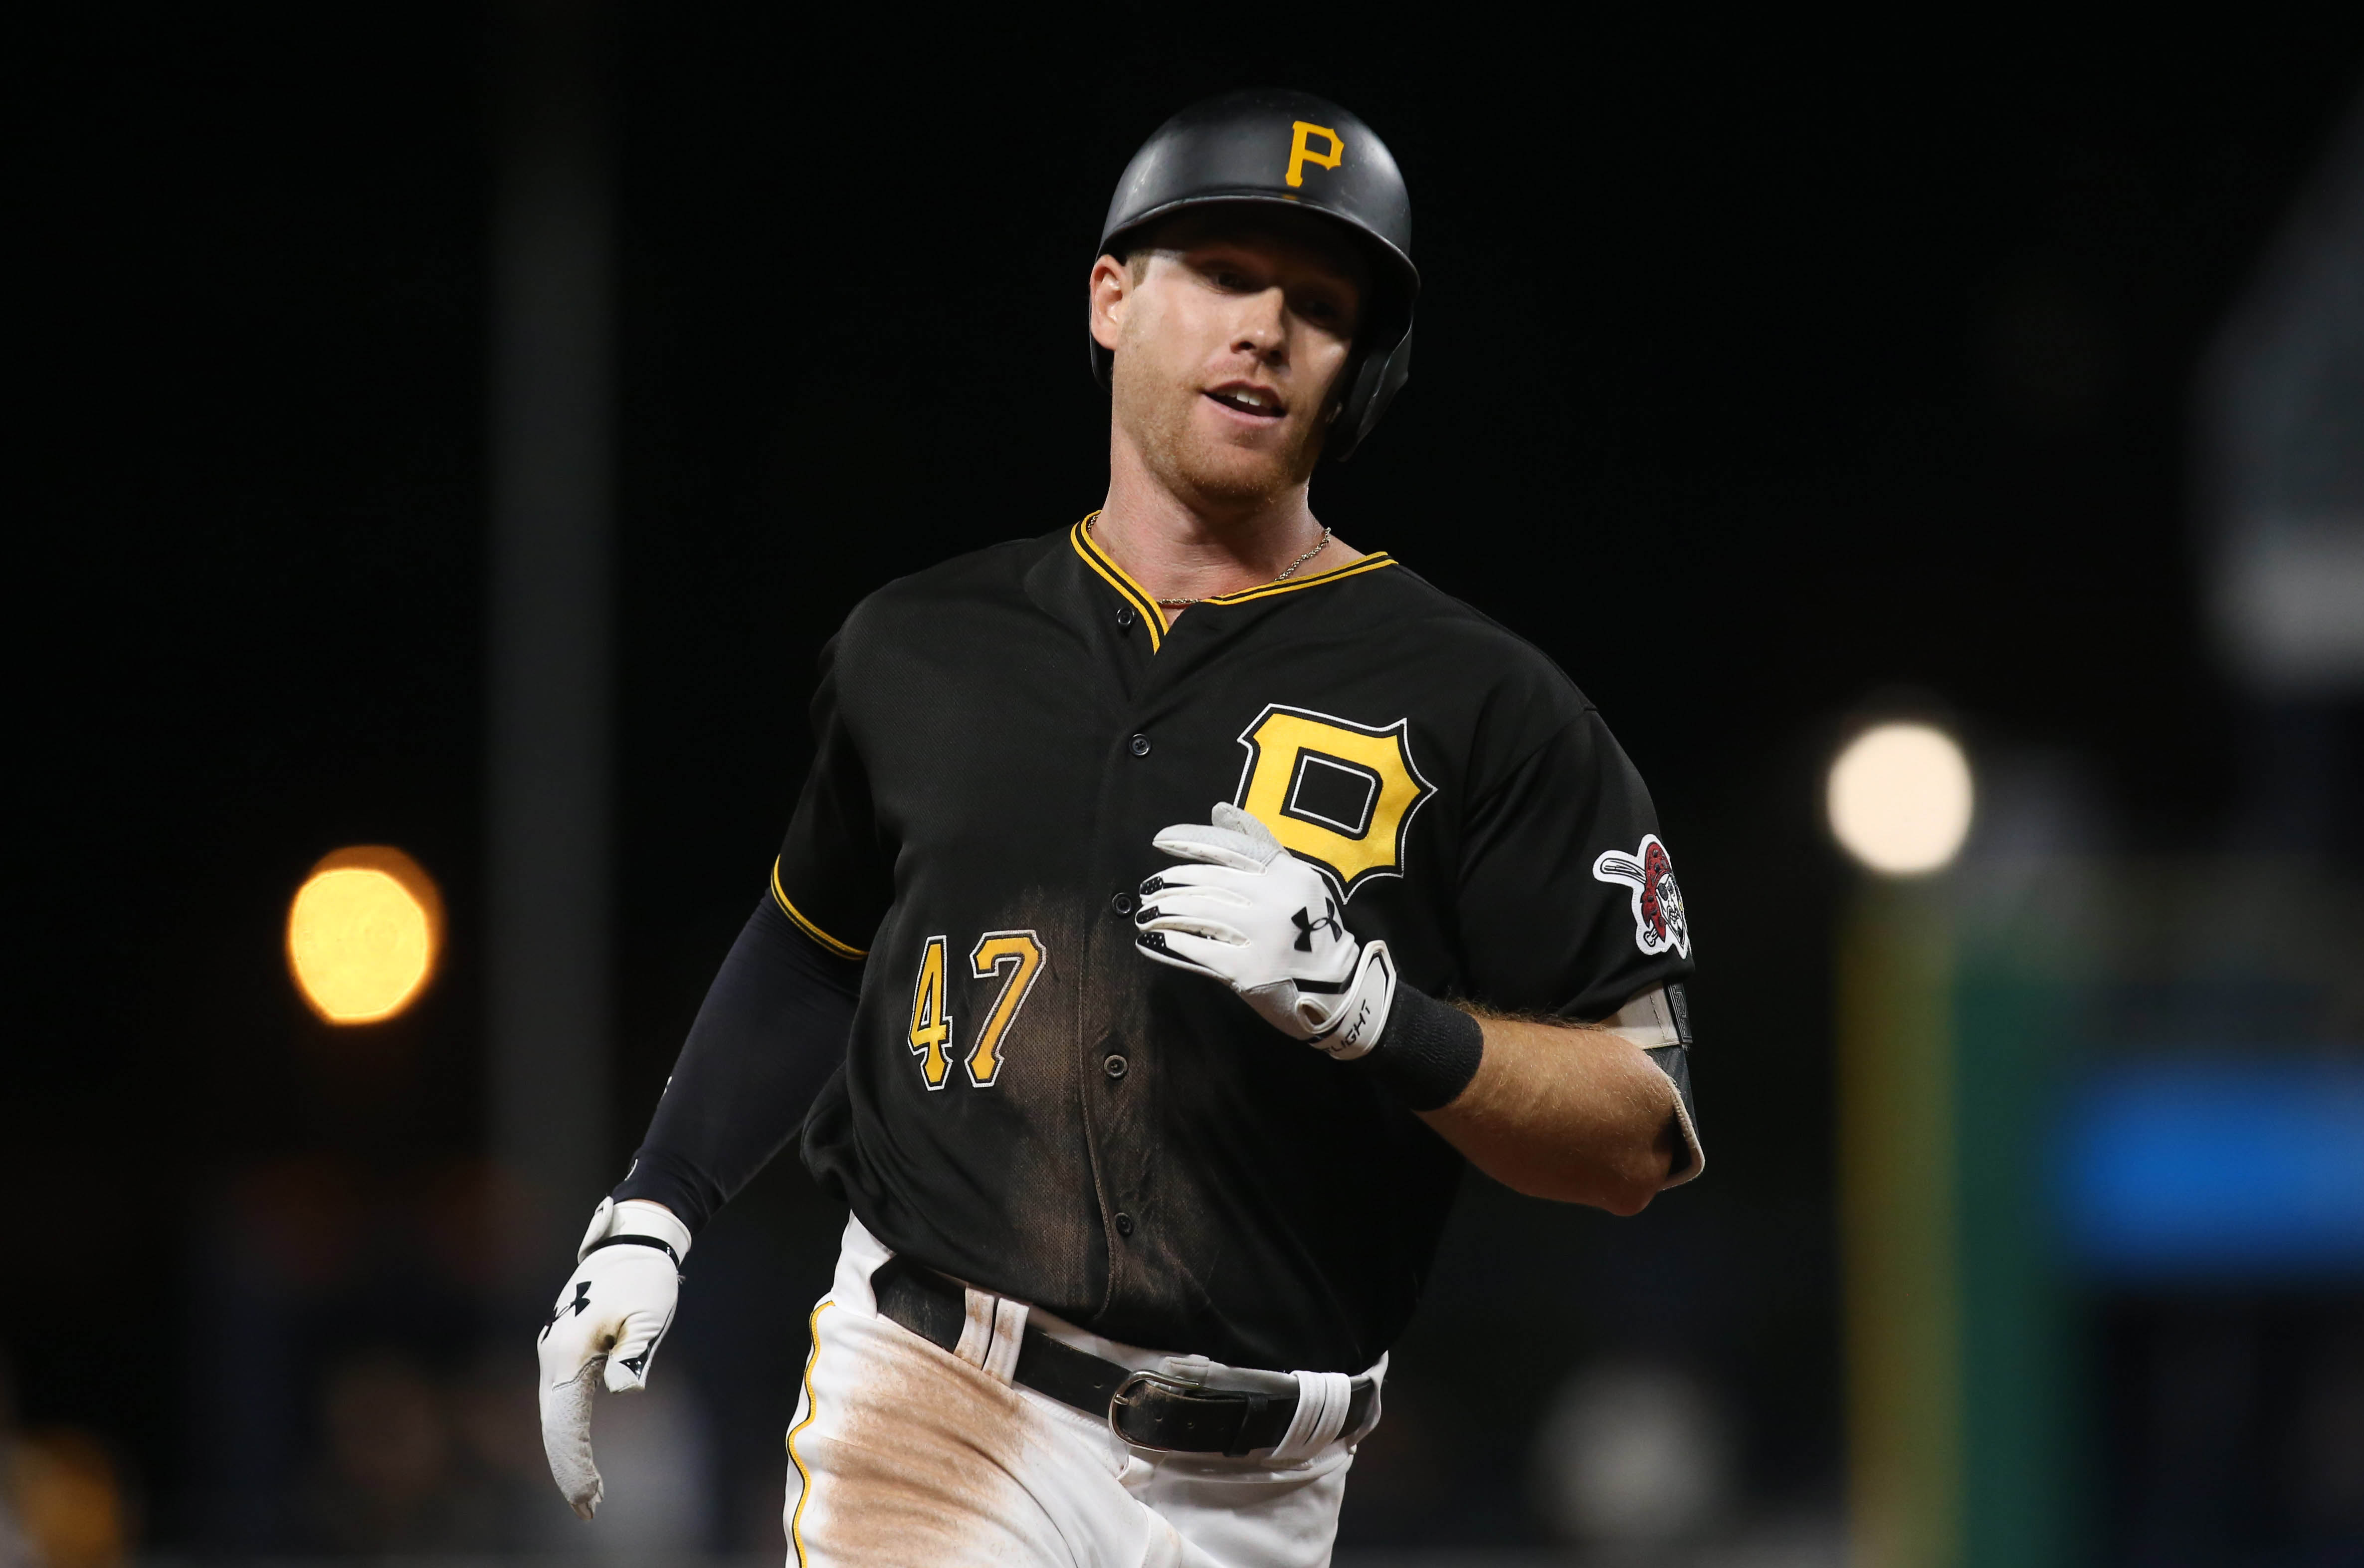 Pittsburgh Pirates Prospect Review: Jordan Luplow